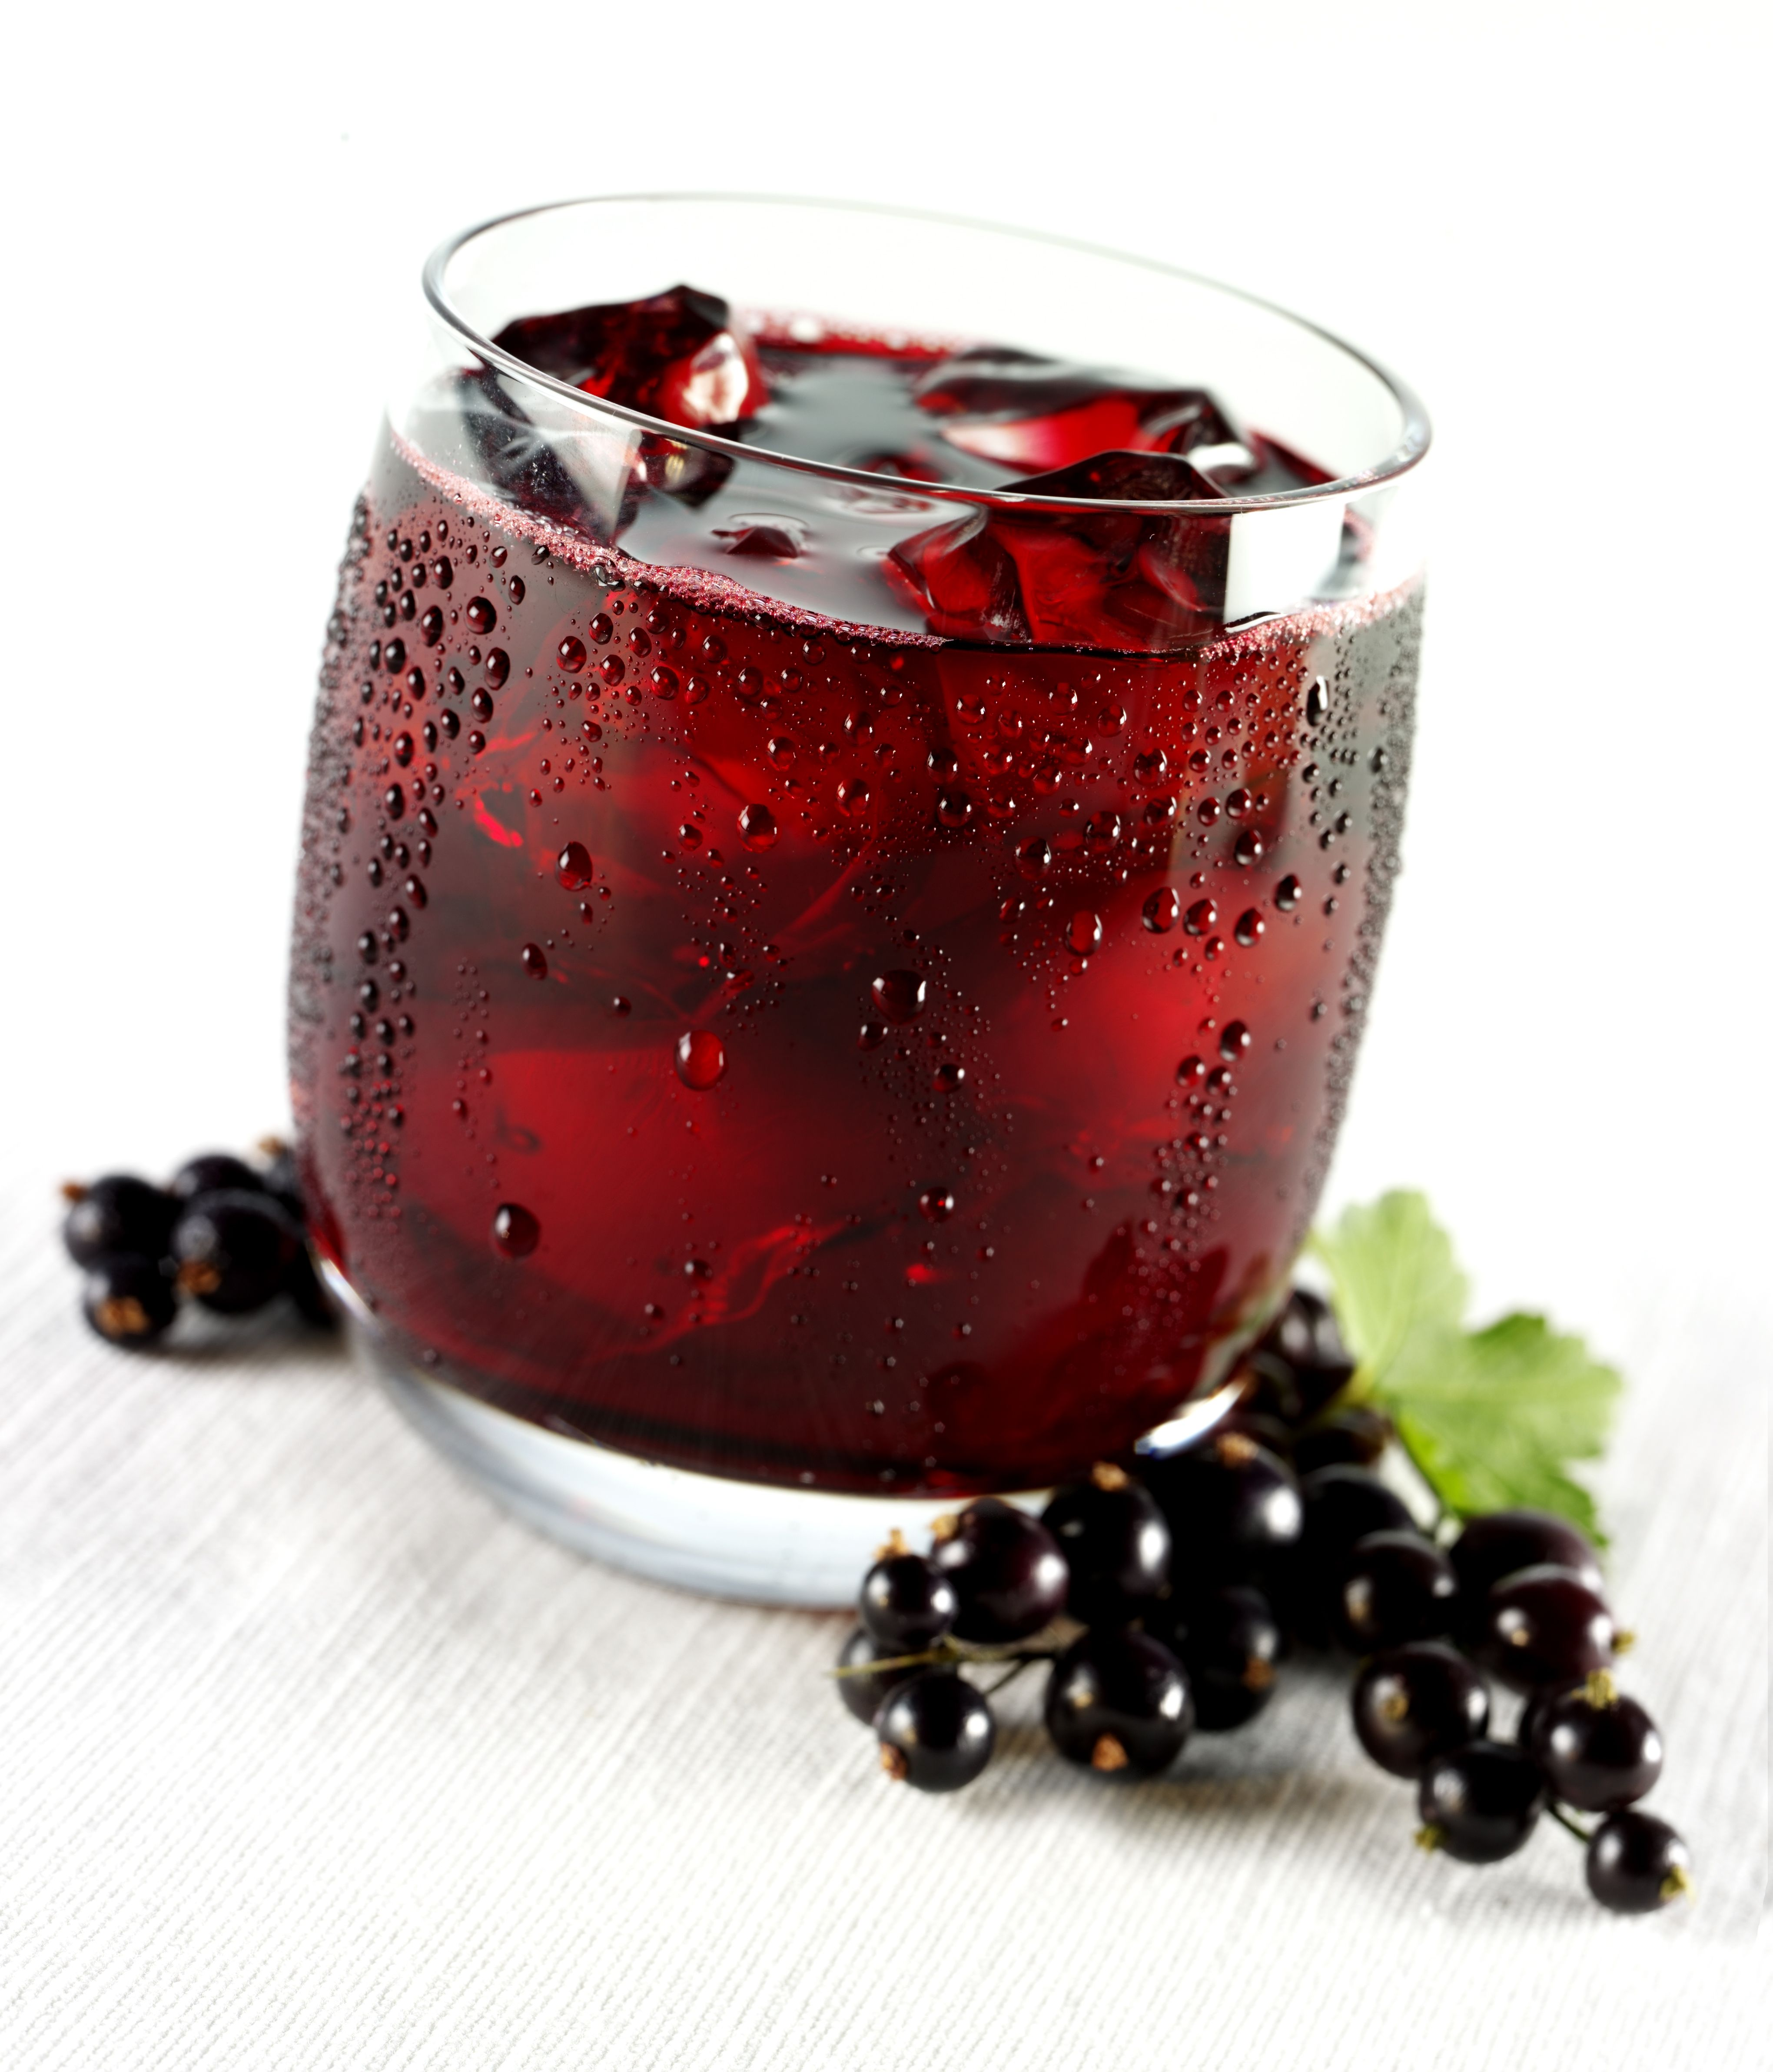 Cranberry Vodka Fizz In 2020 Alcohol Drink Recipes Refreshing Drinks Recipes Mixed Drinks Recipes